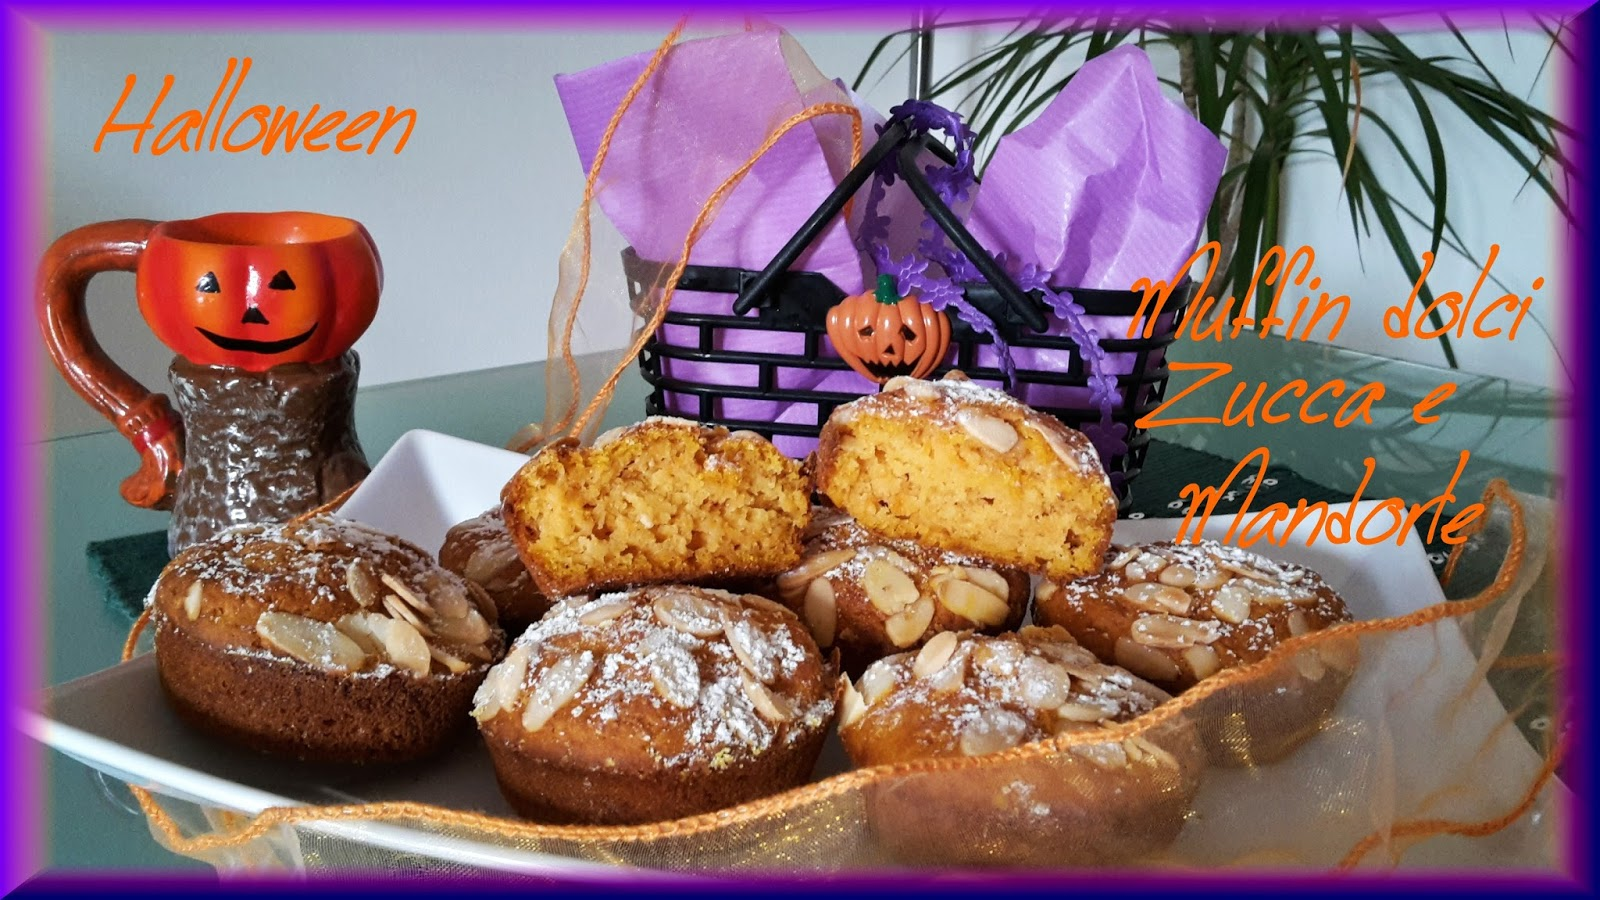 Cortesie In Cucina: Muffin dolci alla zucca e mandorle halloween